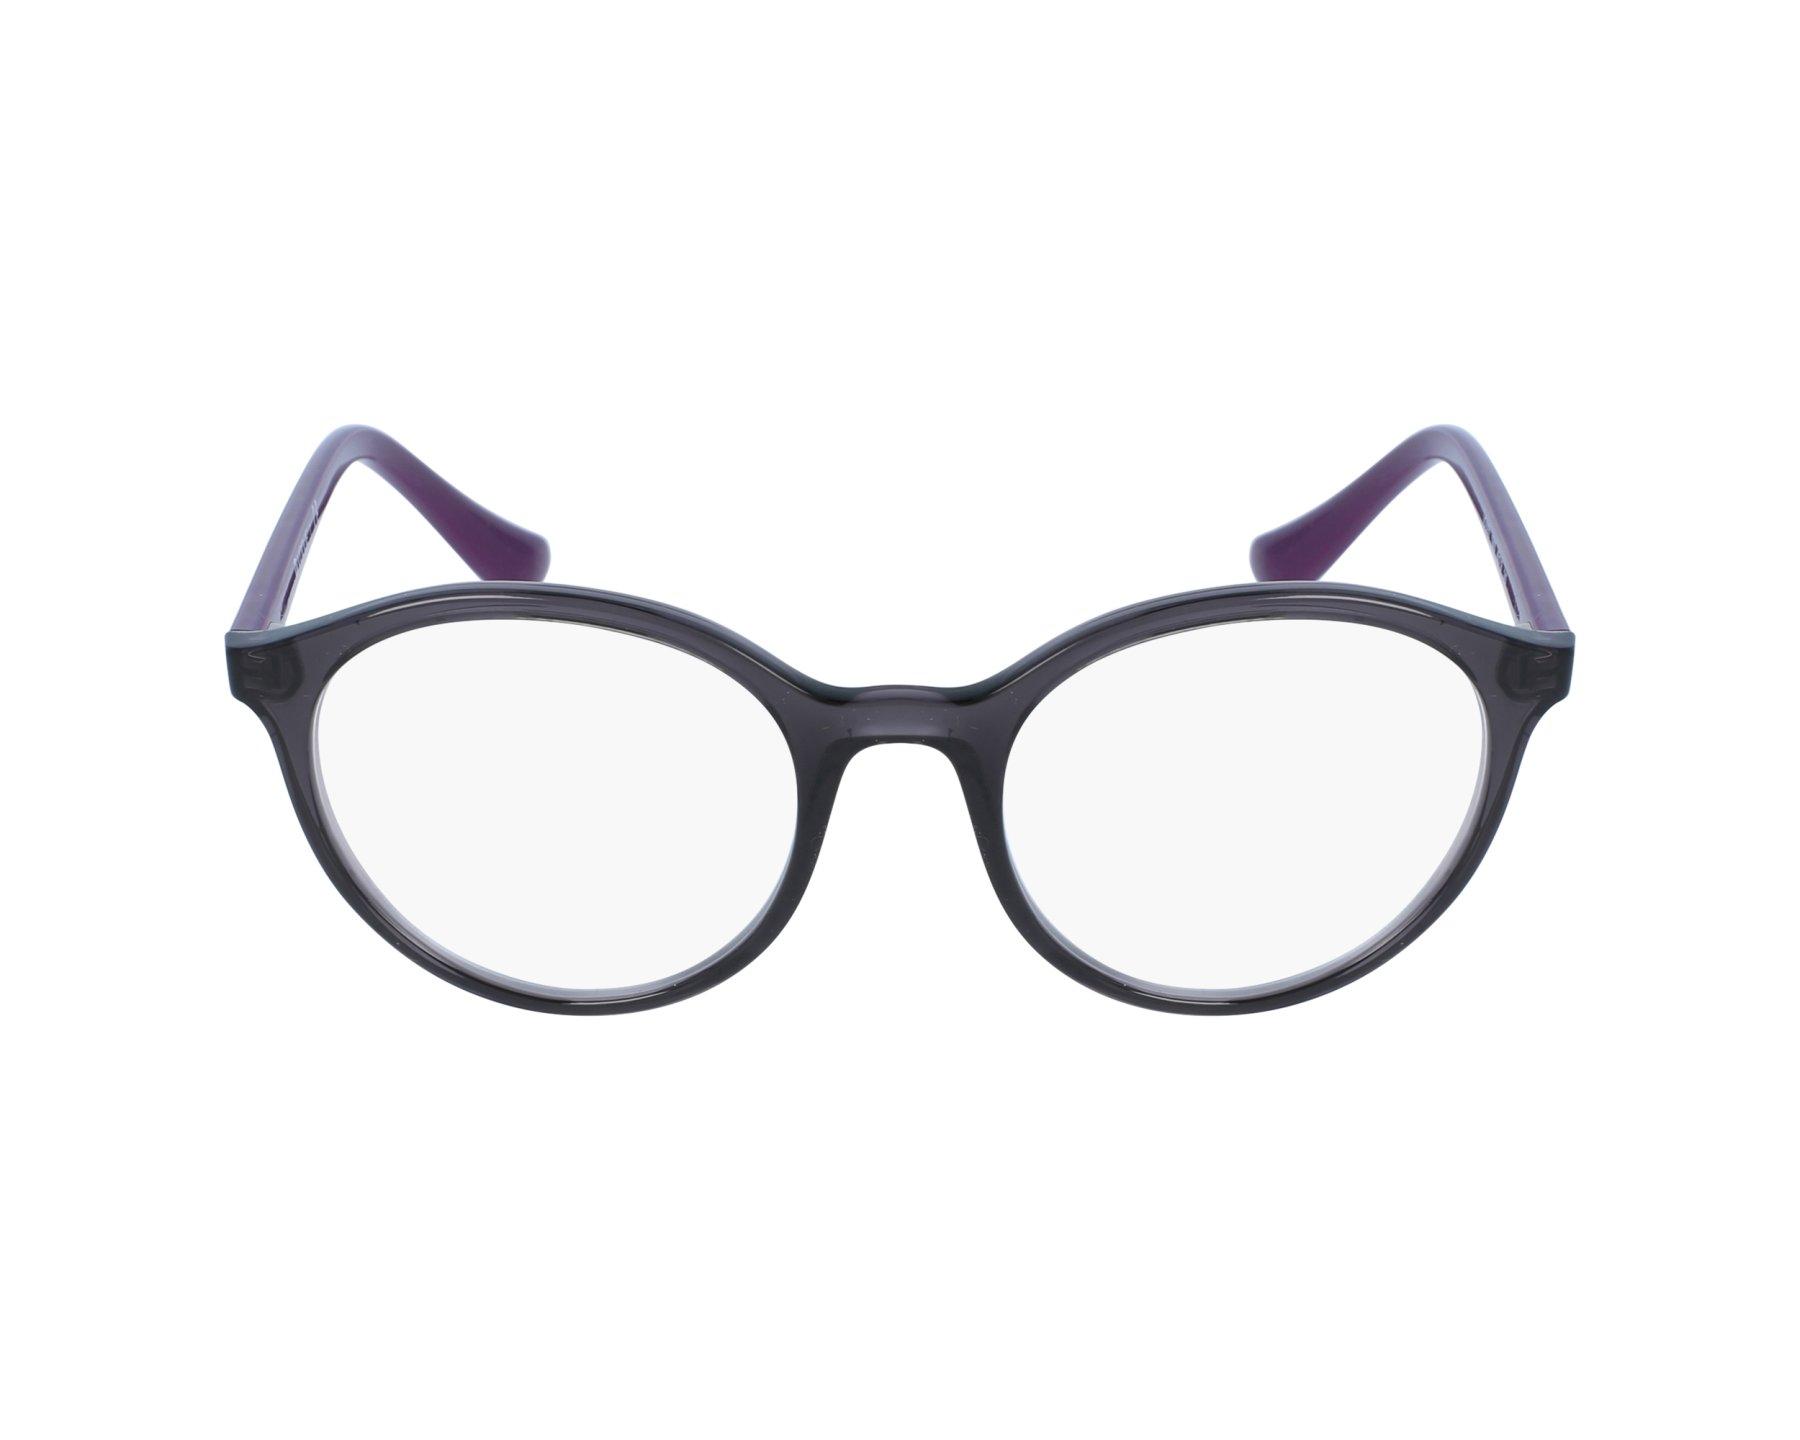 Buy Vogue Eyeglasses VO-5052 1905 Online - Visionet UK